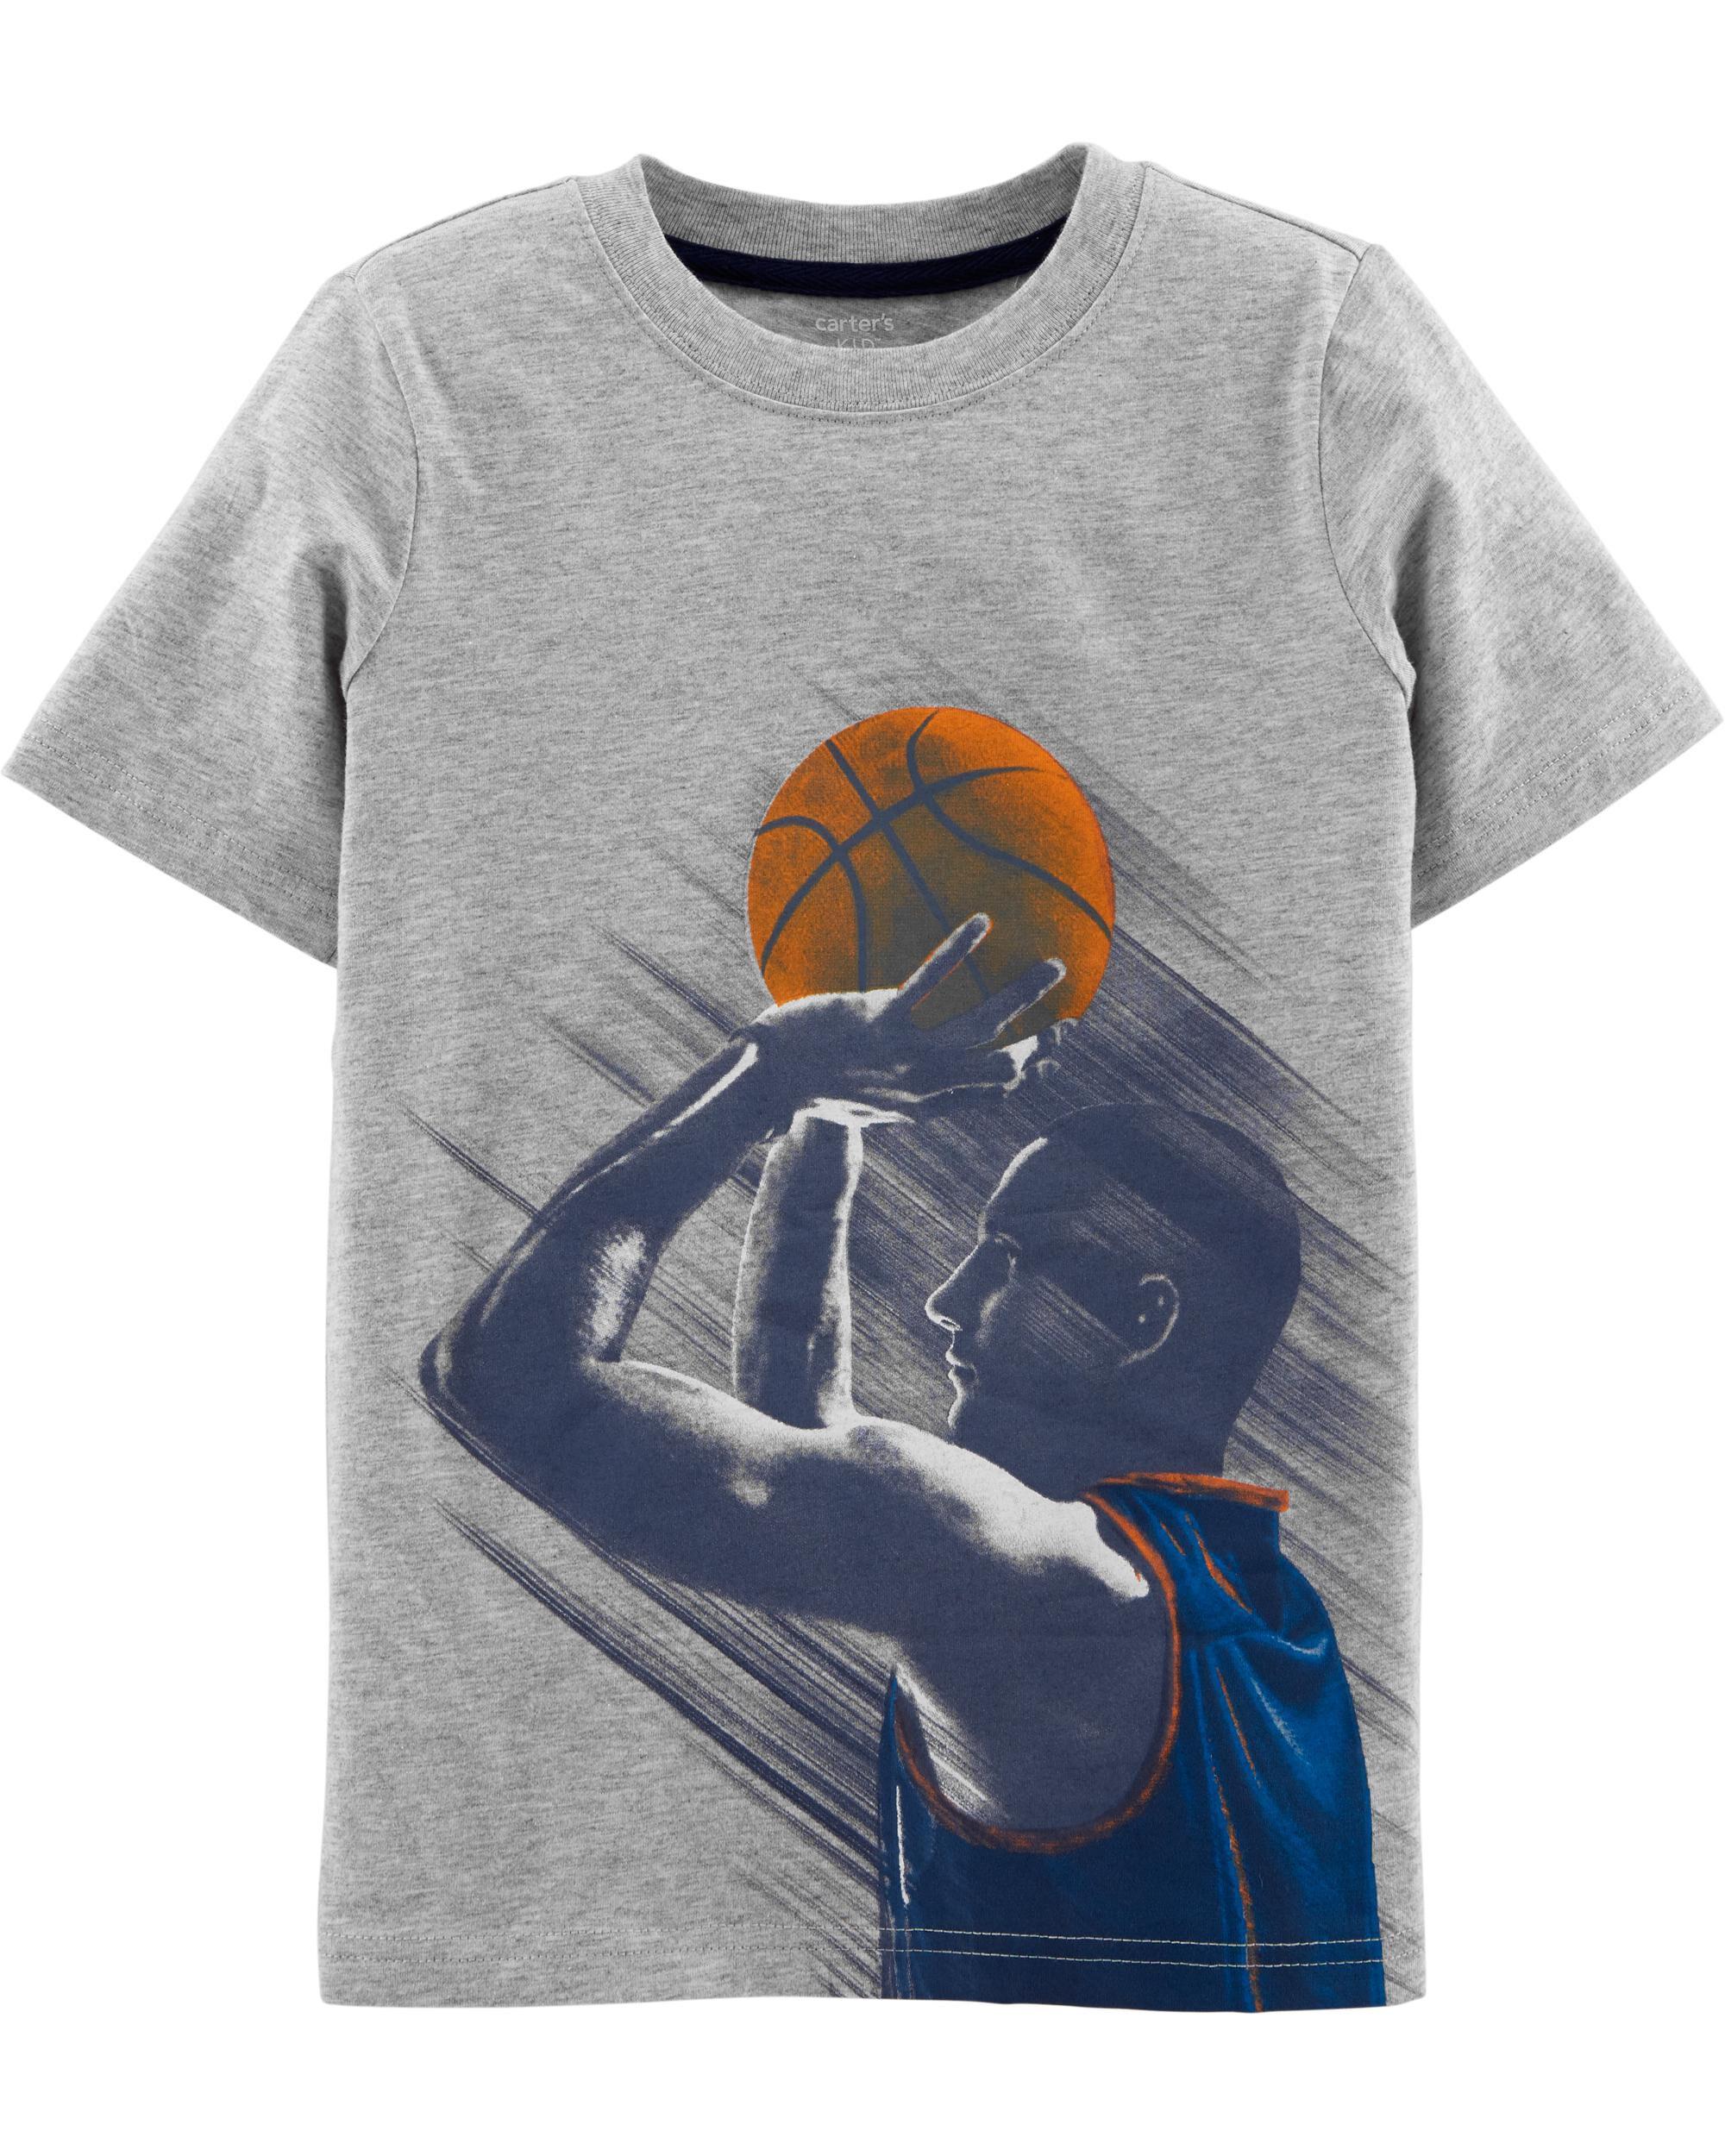 *Clearance*  Basketball Jersey Tee